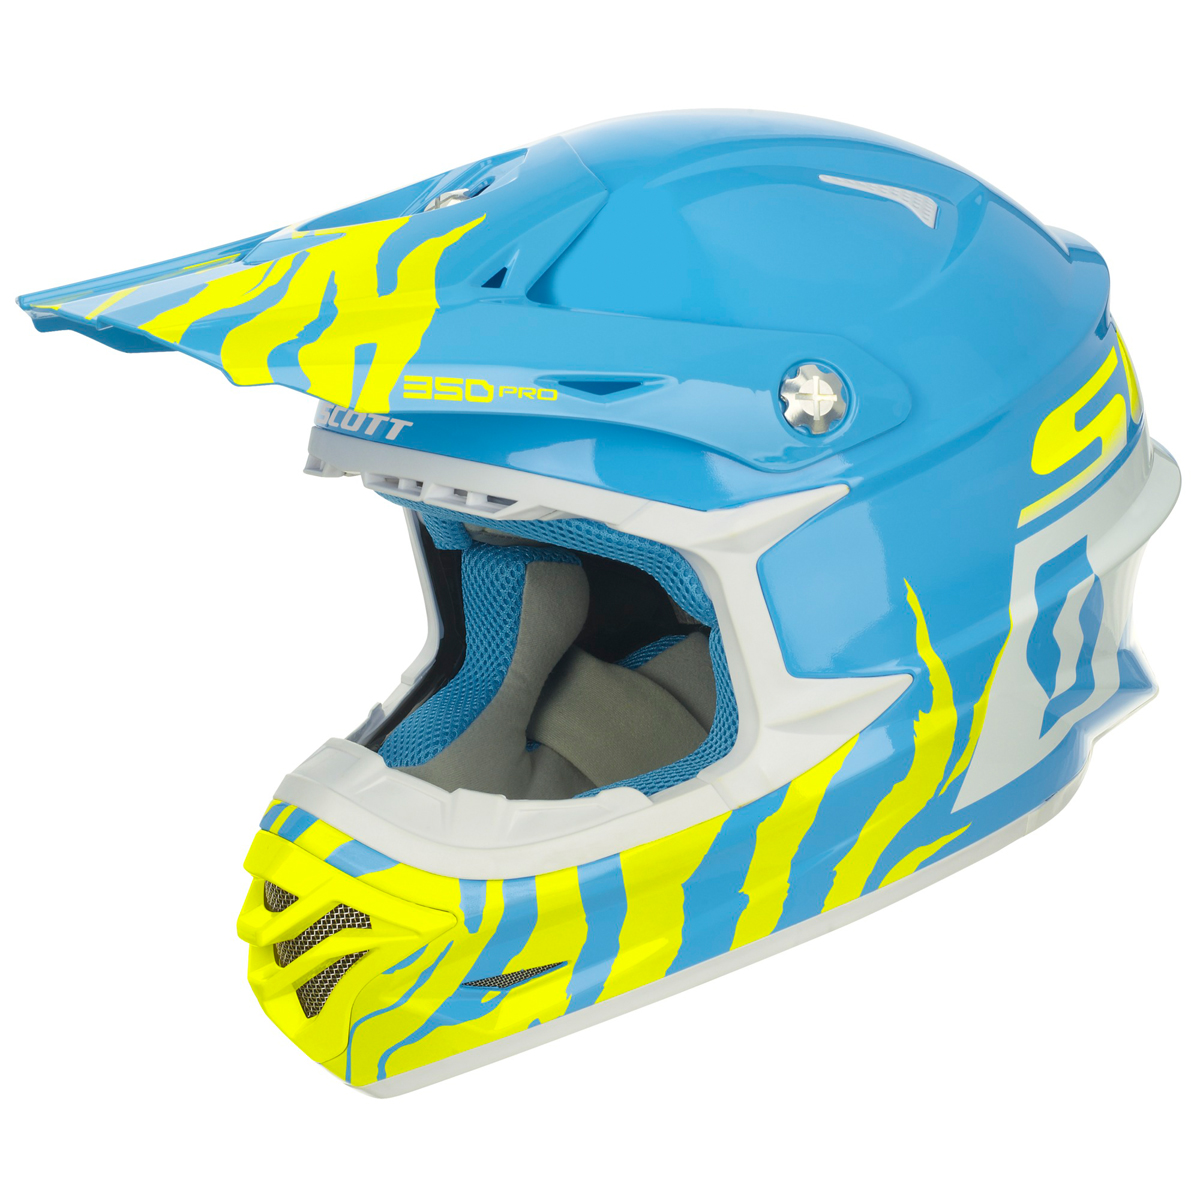 scott 350 pro race mx enduro motorrad bike helm blau. Black Bedroom Furniture Sets. Home Design Ideas